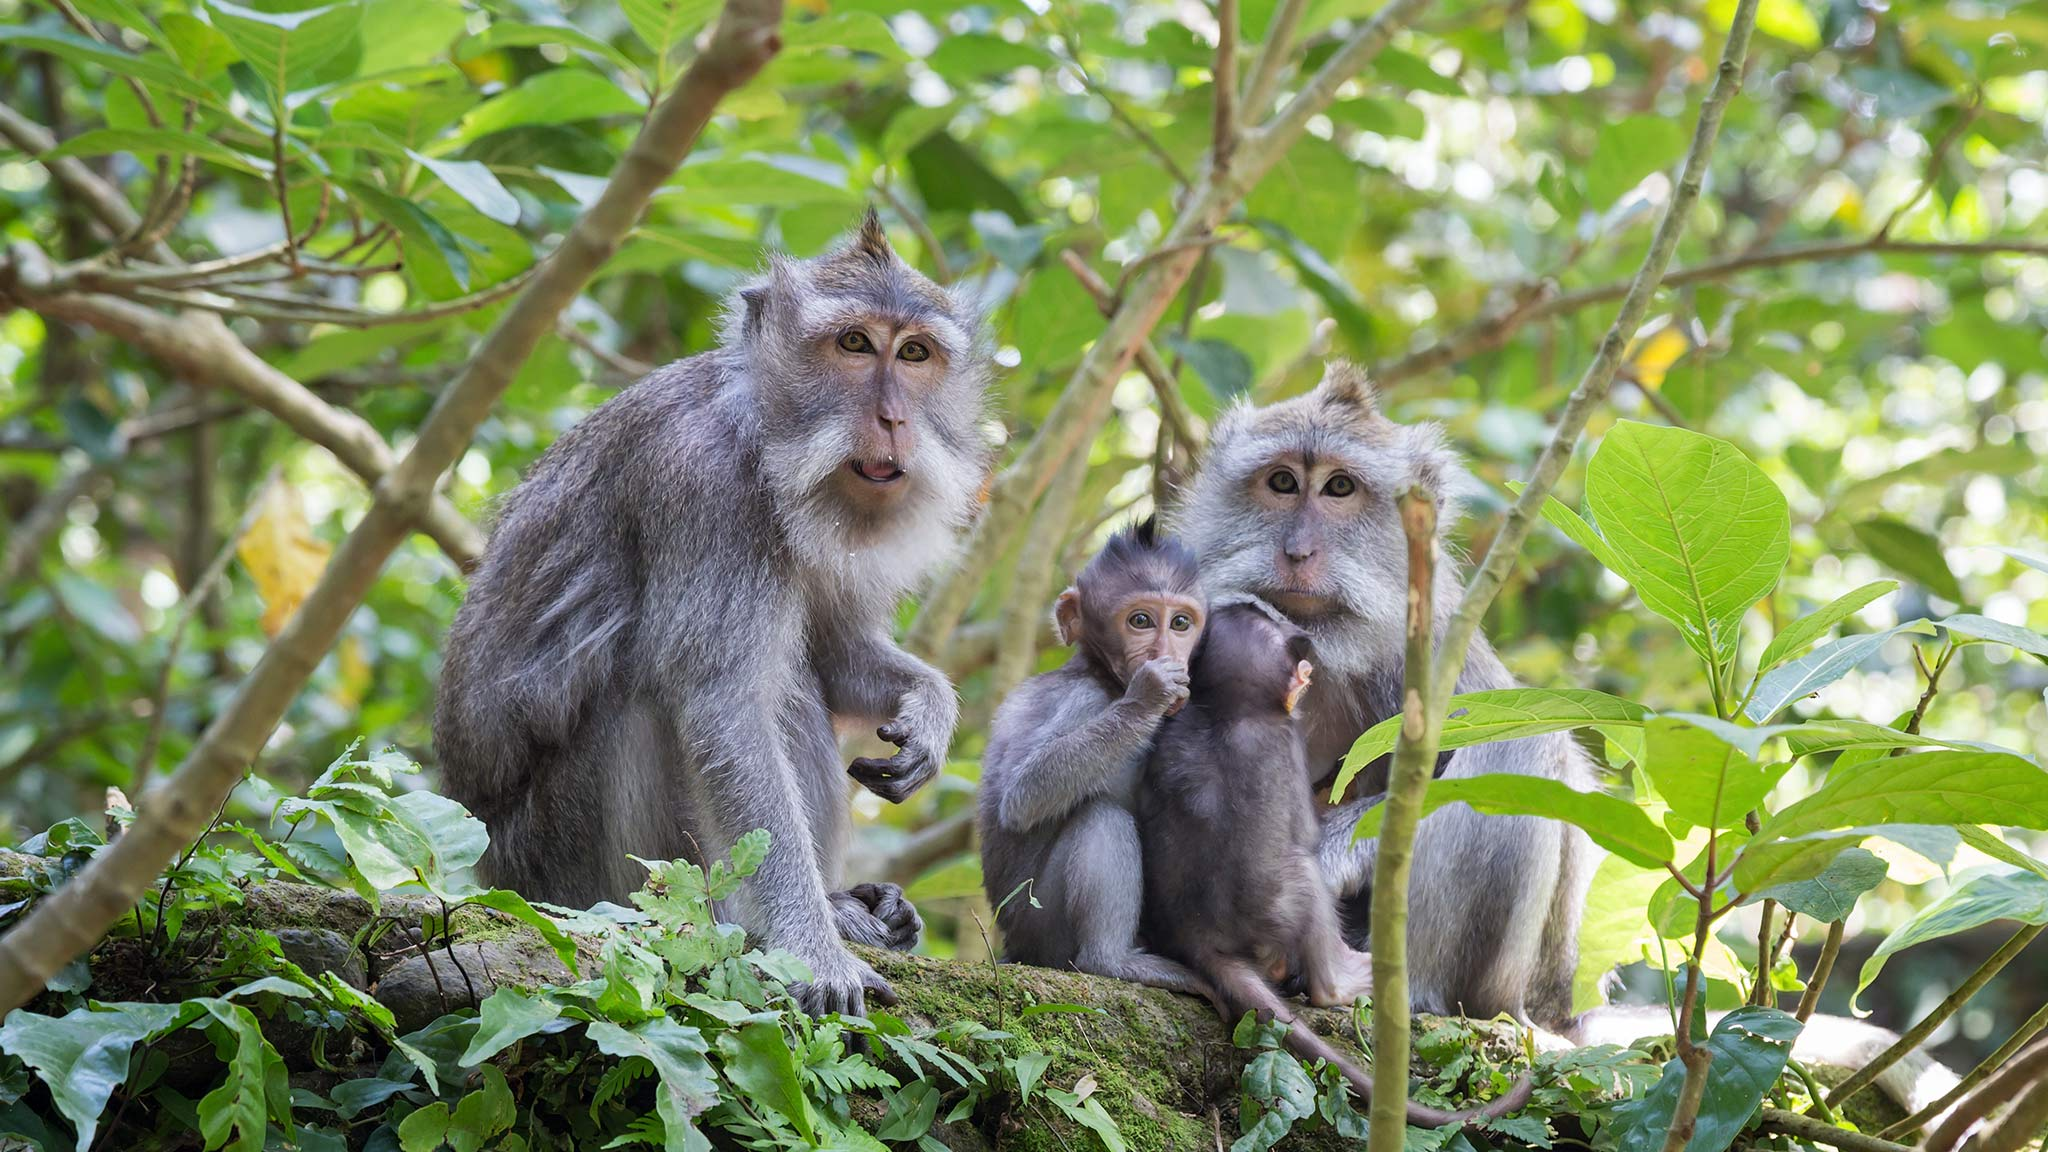 Four monkeys sitting on a ruin in the Ubud Monkey Forest in Bali